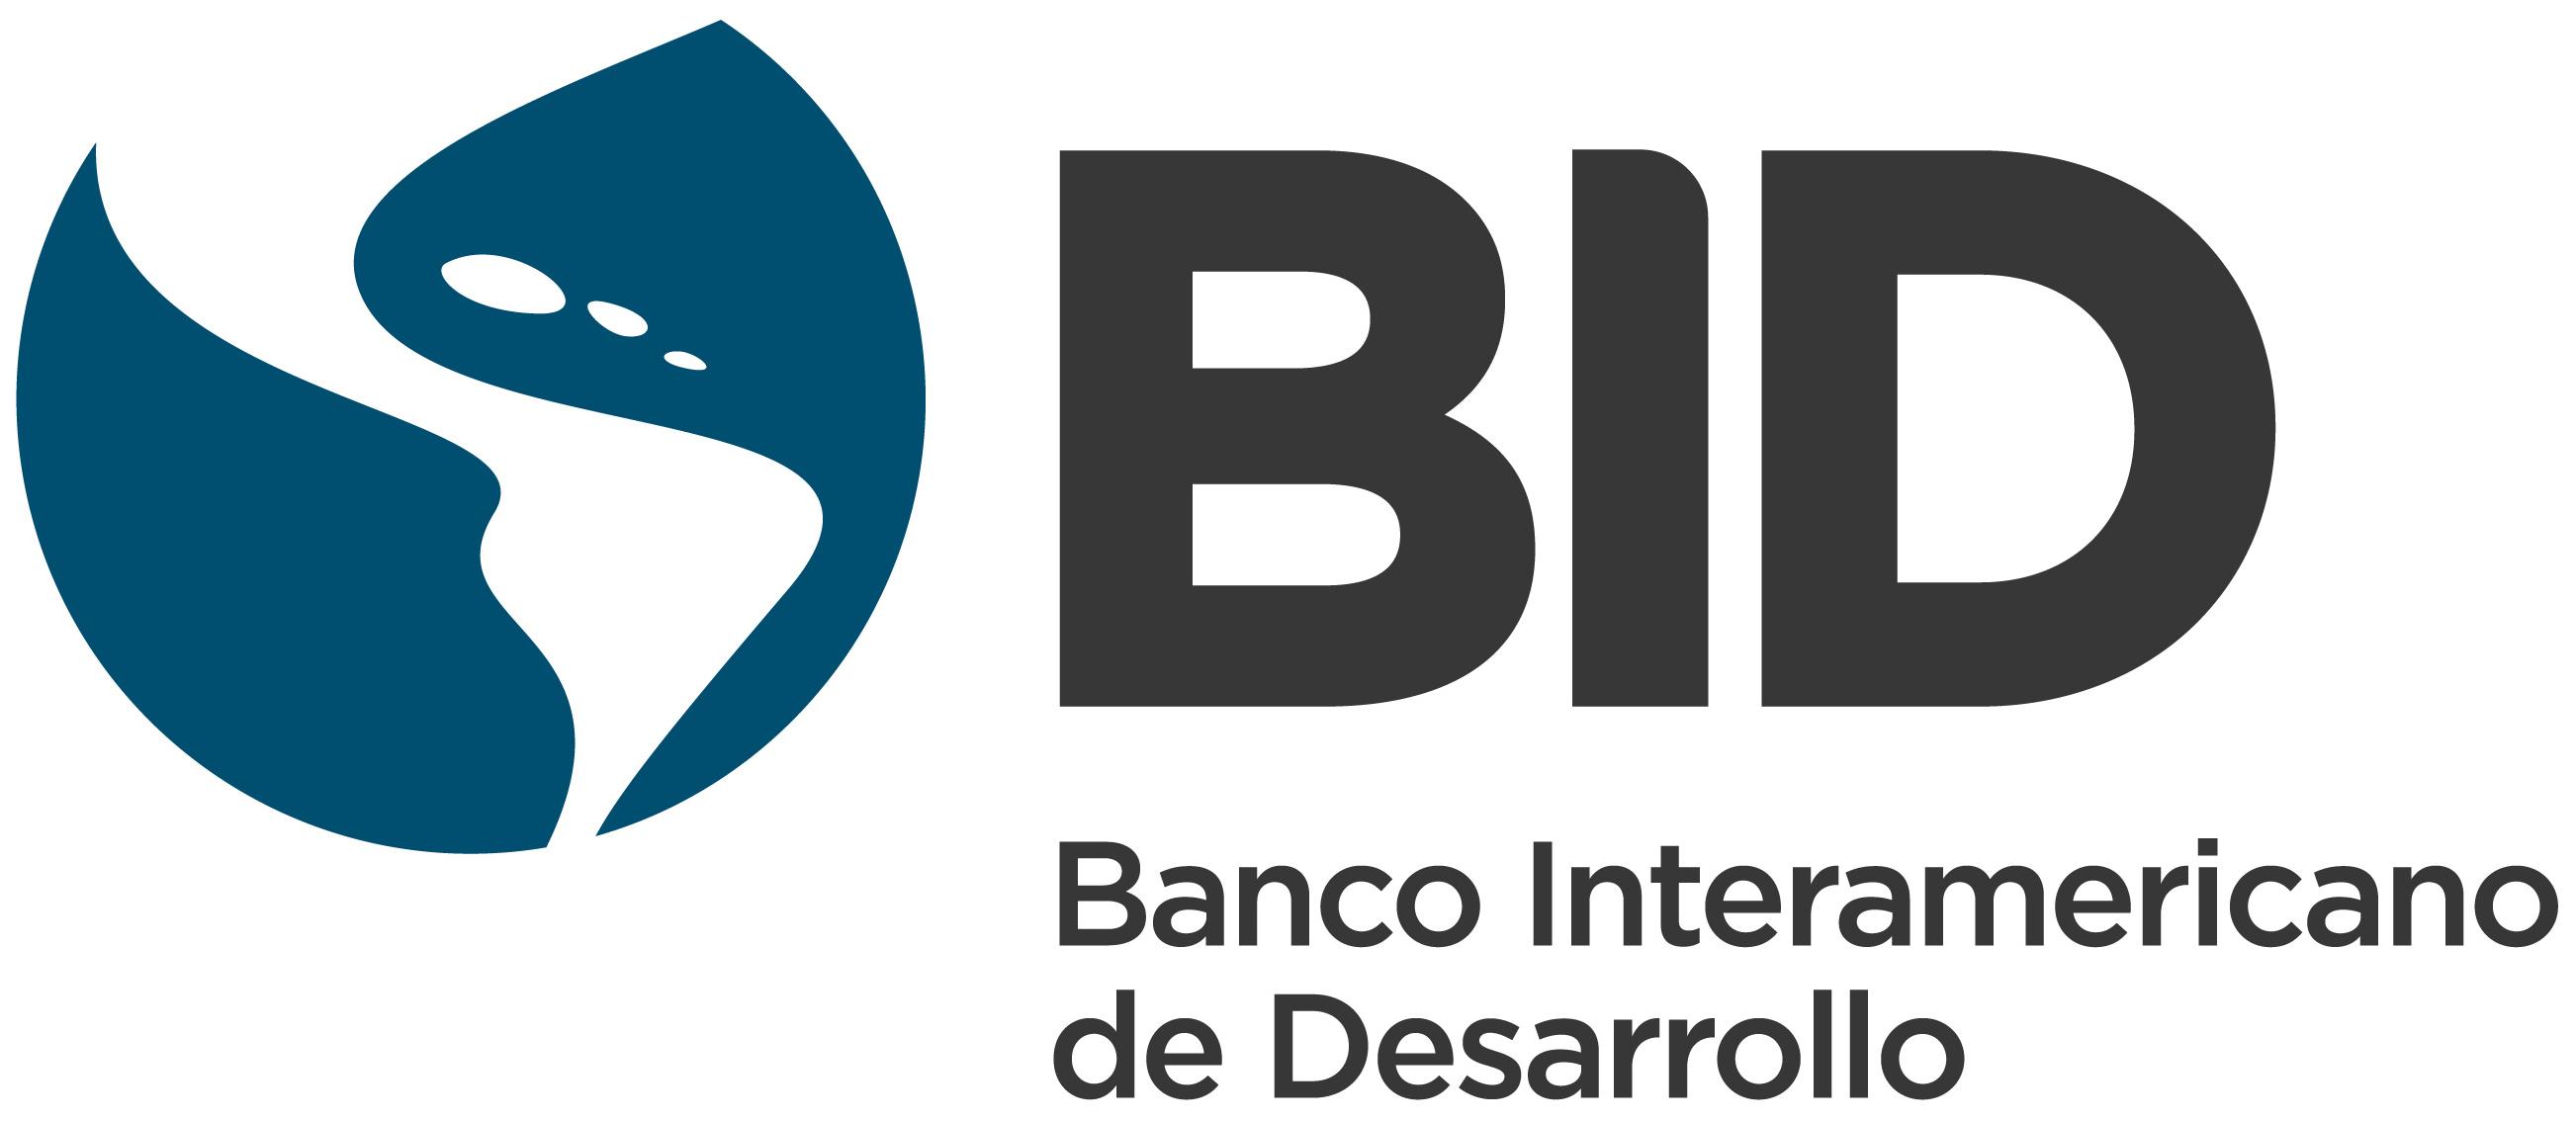 Gobierno declara asamblea del BID en Paraguay de interés nacional ...